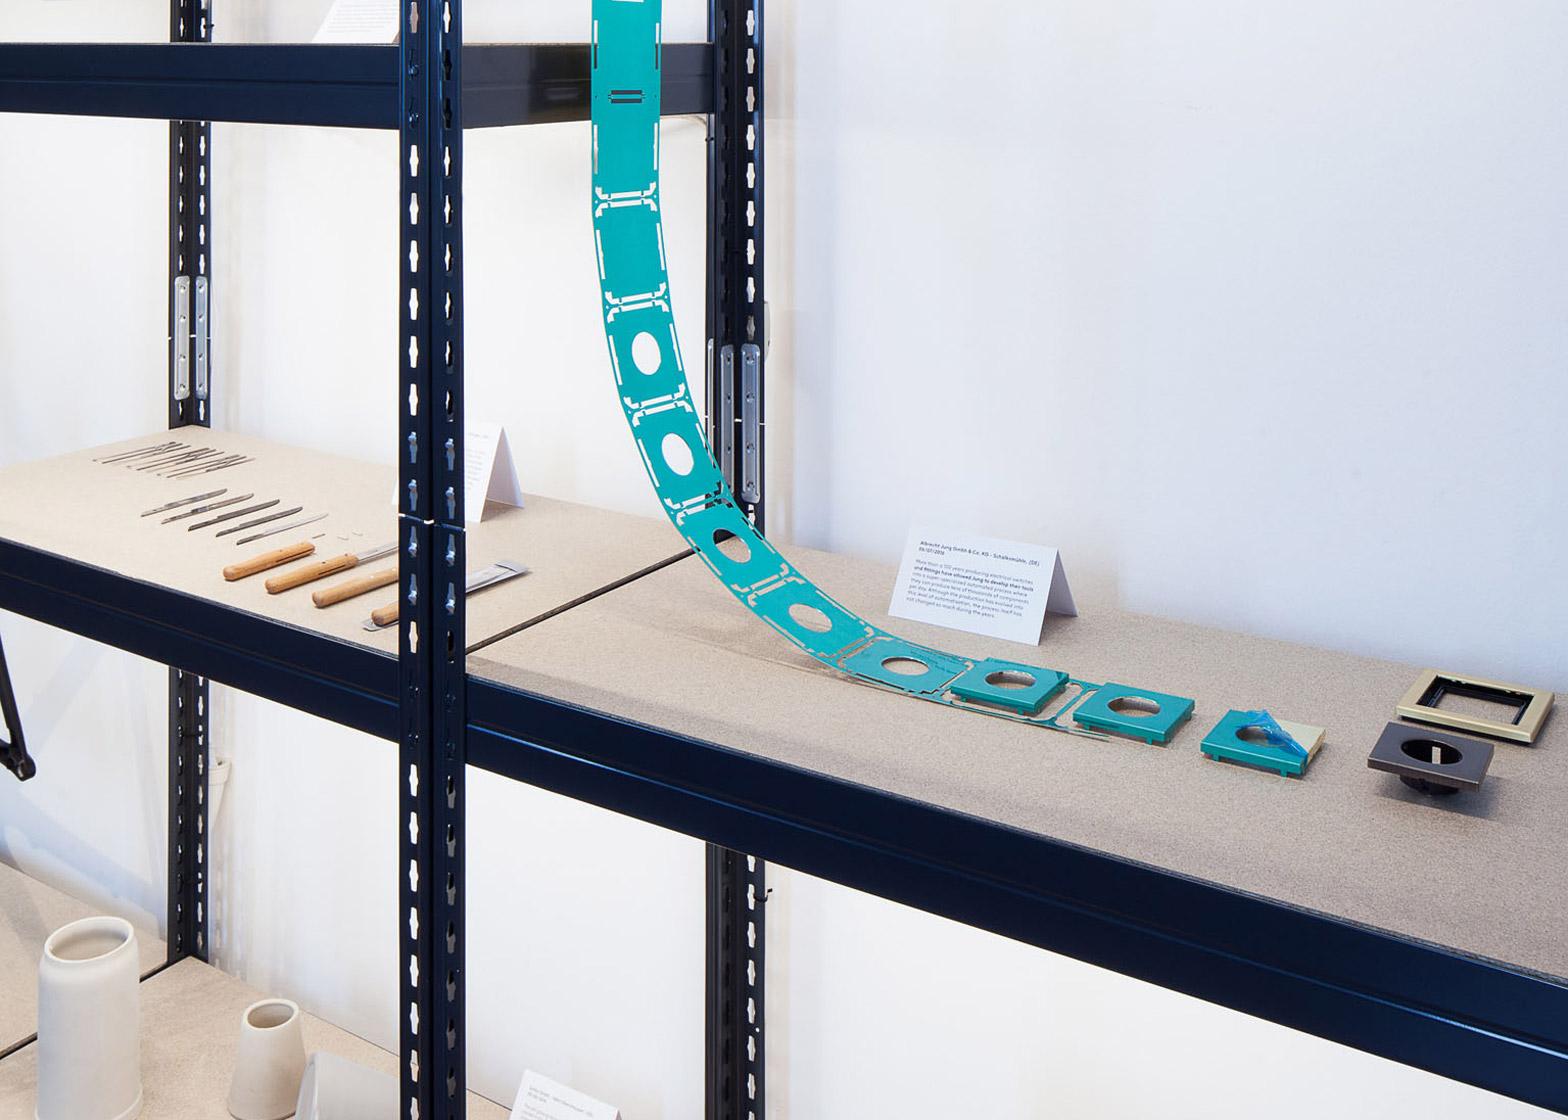 Friends + Design exhibition explored the relationships between designers